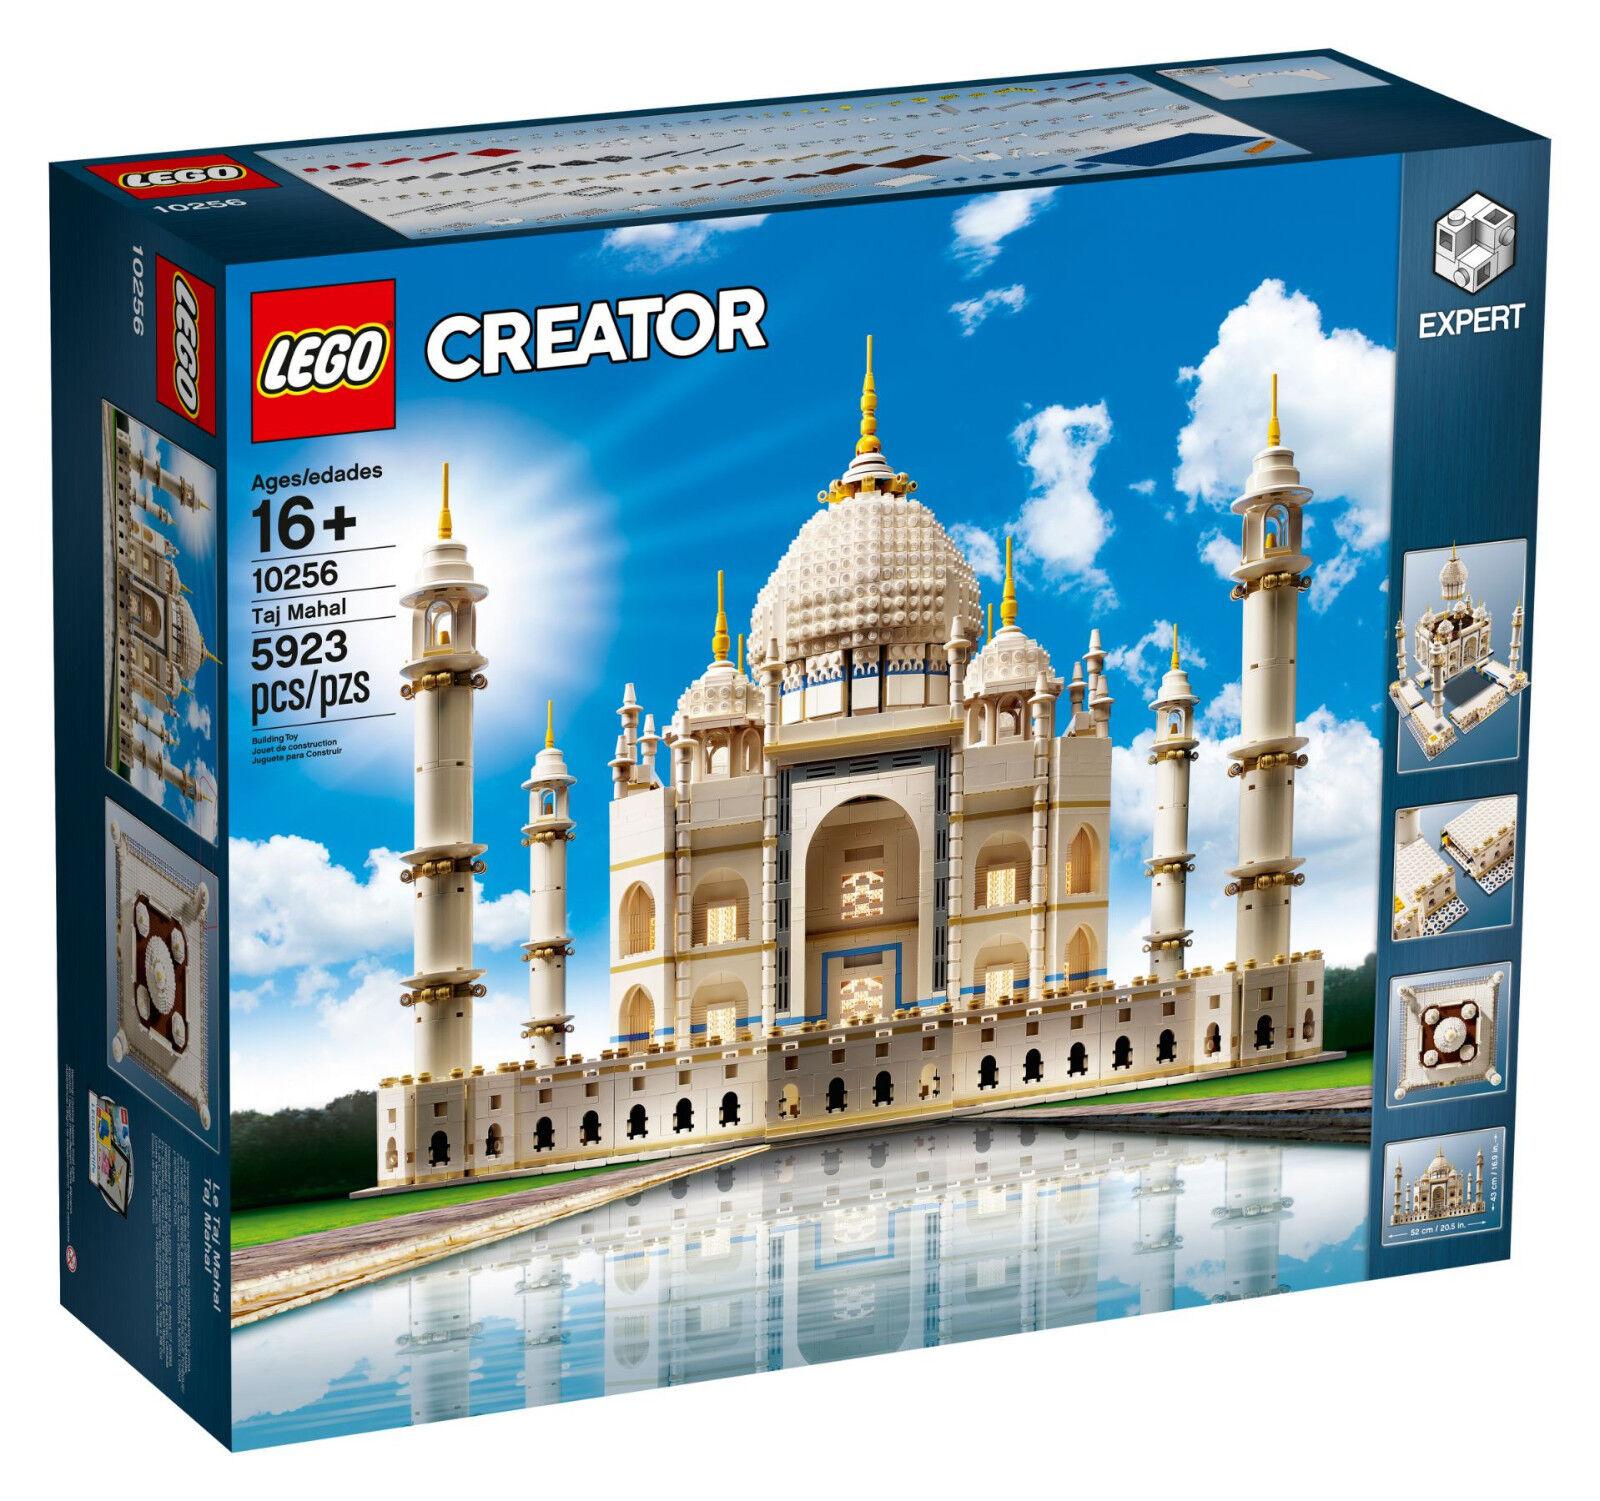 Lego Creator Expert 10256 Taj Mahal neuf dans sa boîte neuf livraison rapide